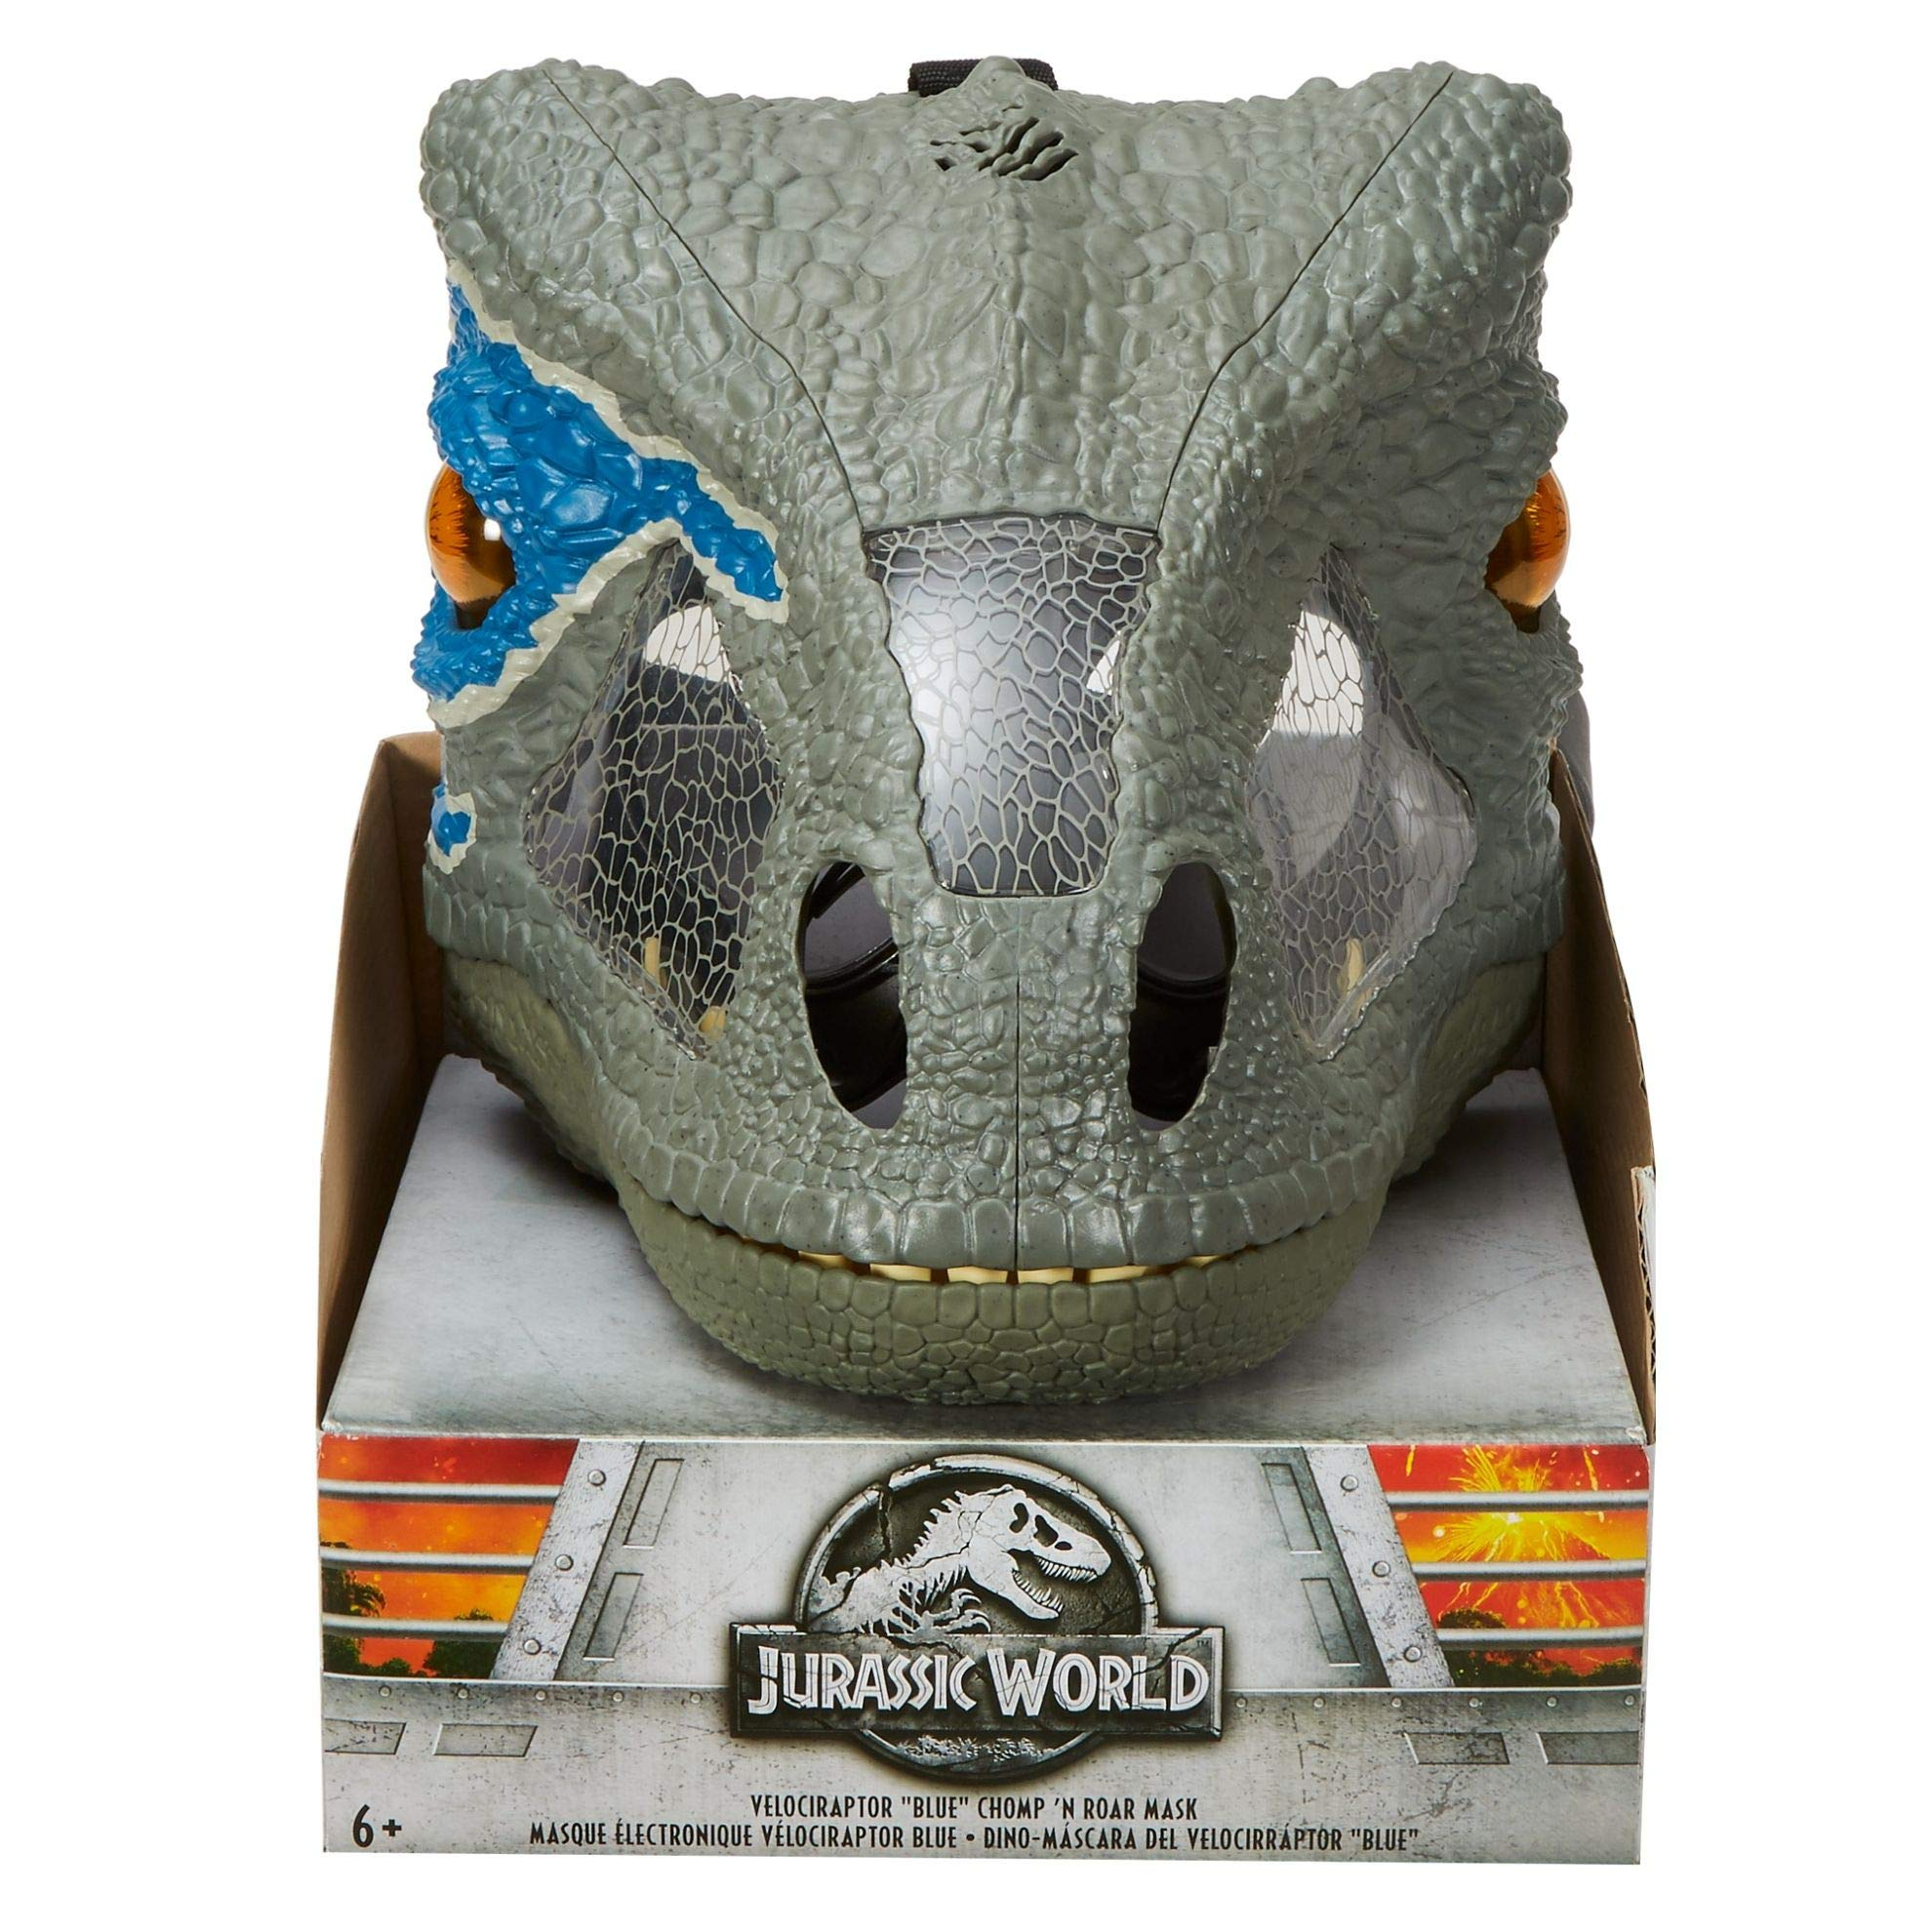 Jurassic World Chomp 'n Roar Mask Velociraptor ''blue'' by Jurassic World Toys (Image #9)